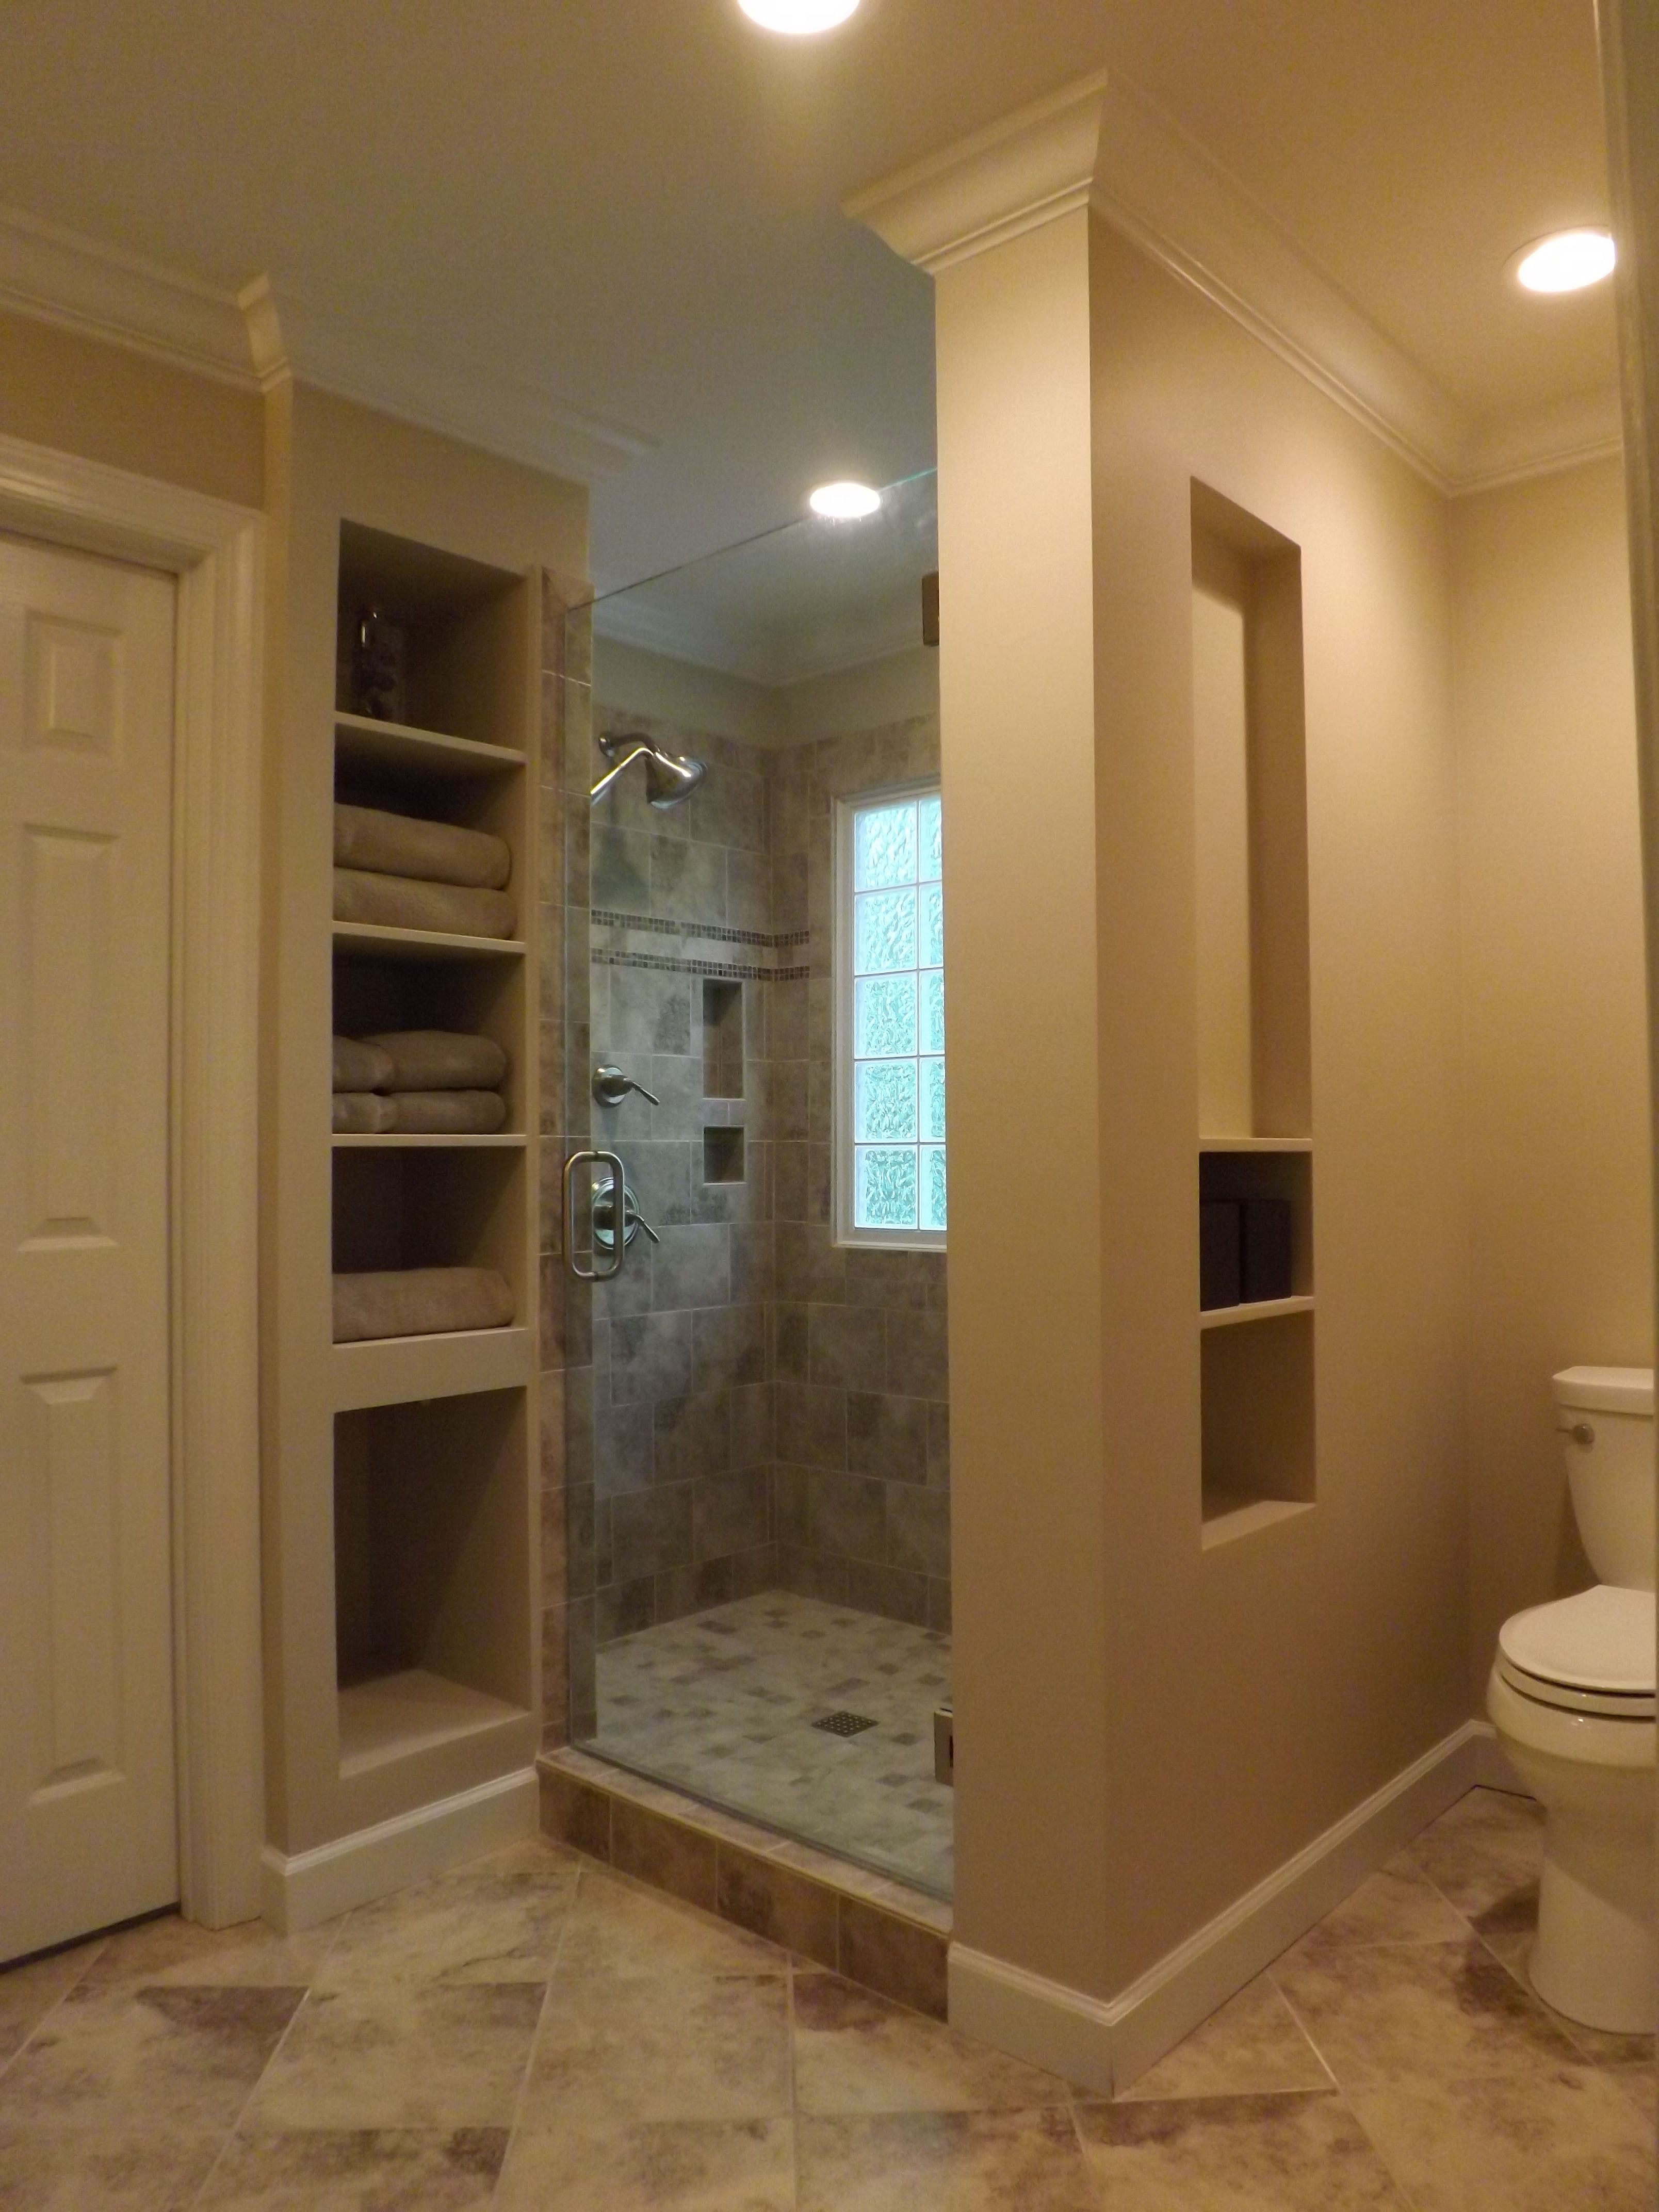 Small Bathroom Remodel Ideas Ikea Remodel Ideas Cost Of Remodeling Adorable Bathroom Remodeled Decorating Design